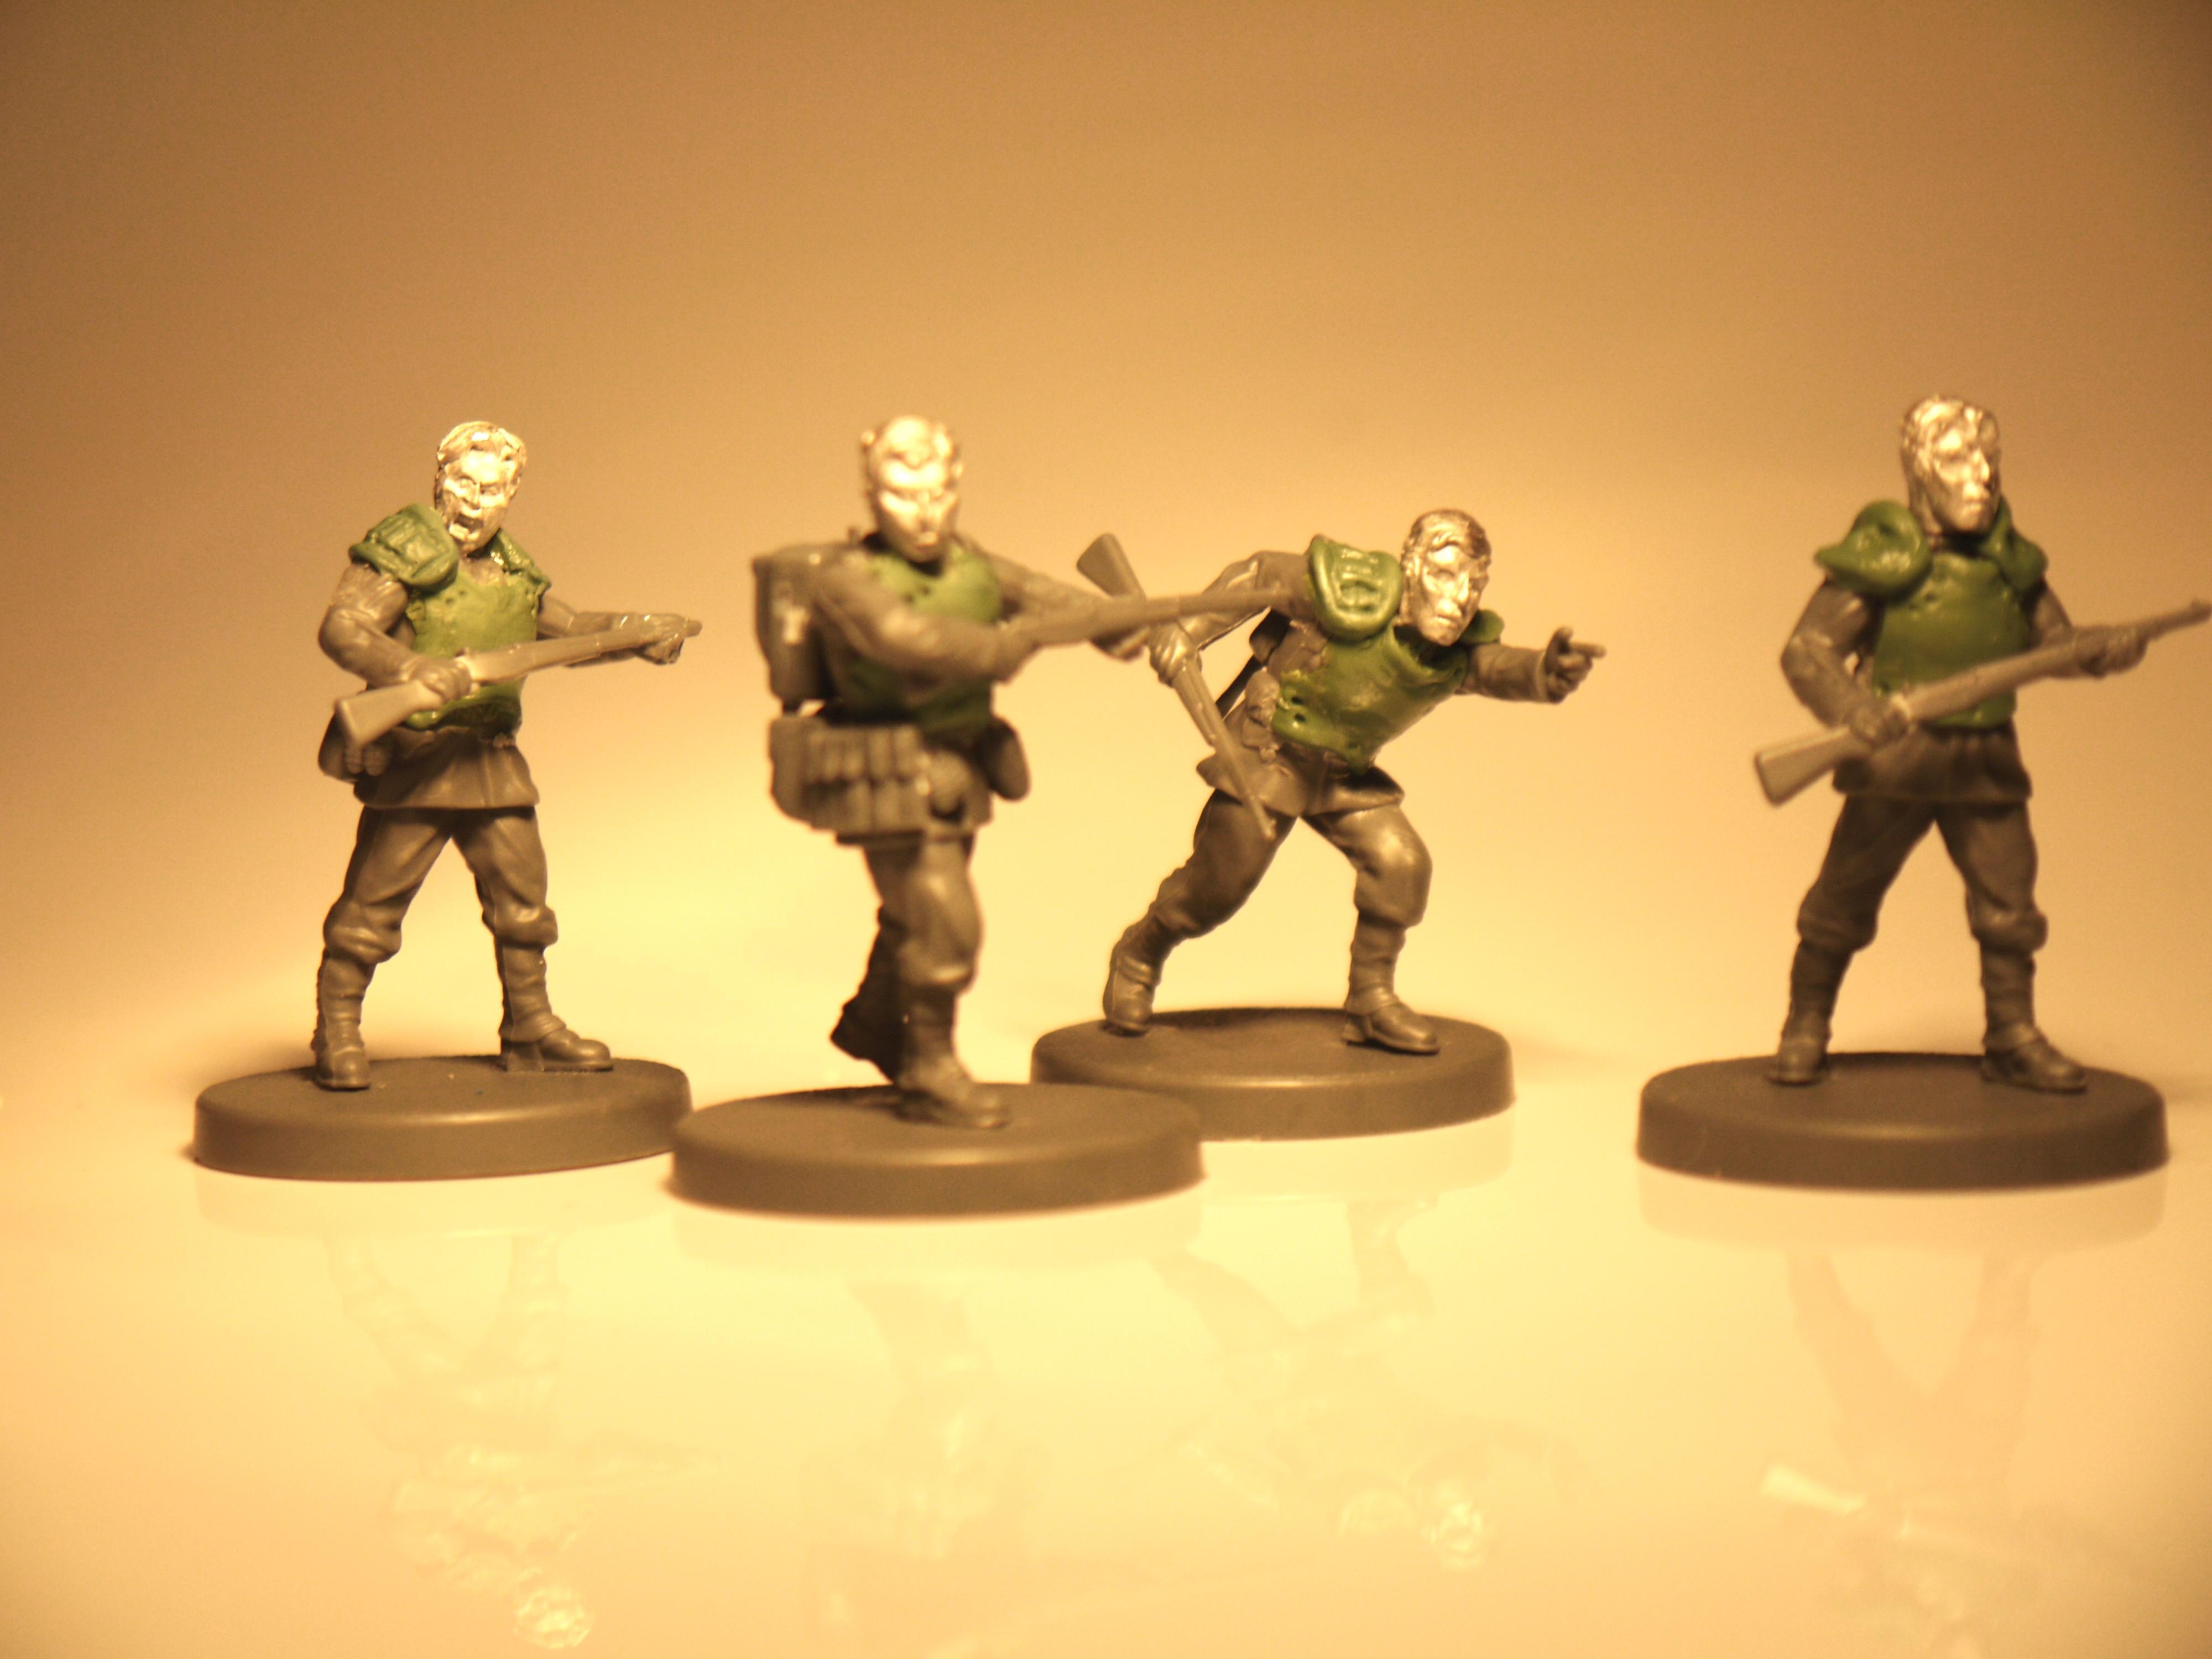 America, Anzac, Conscript, Fallout, M1 Garand, Ncr, Post Apocalyptic, Recruit, Rifle, Soldier